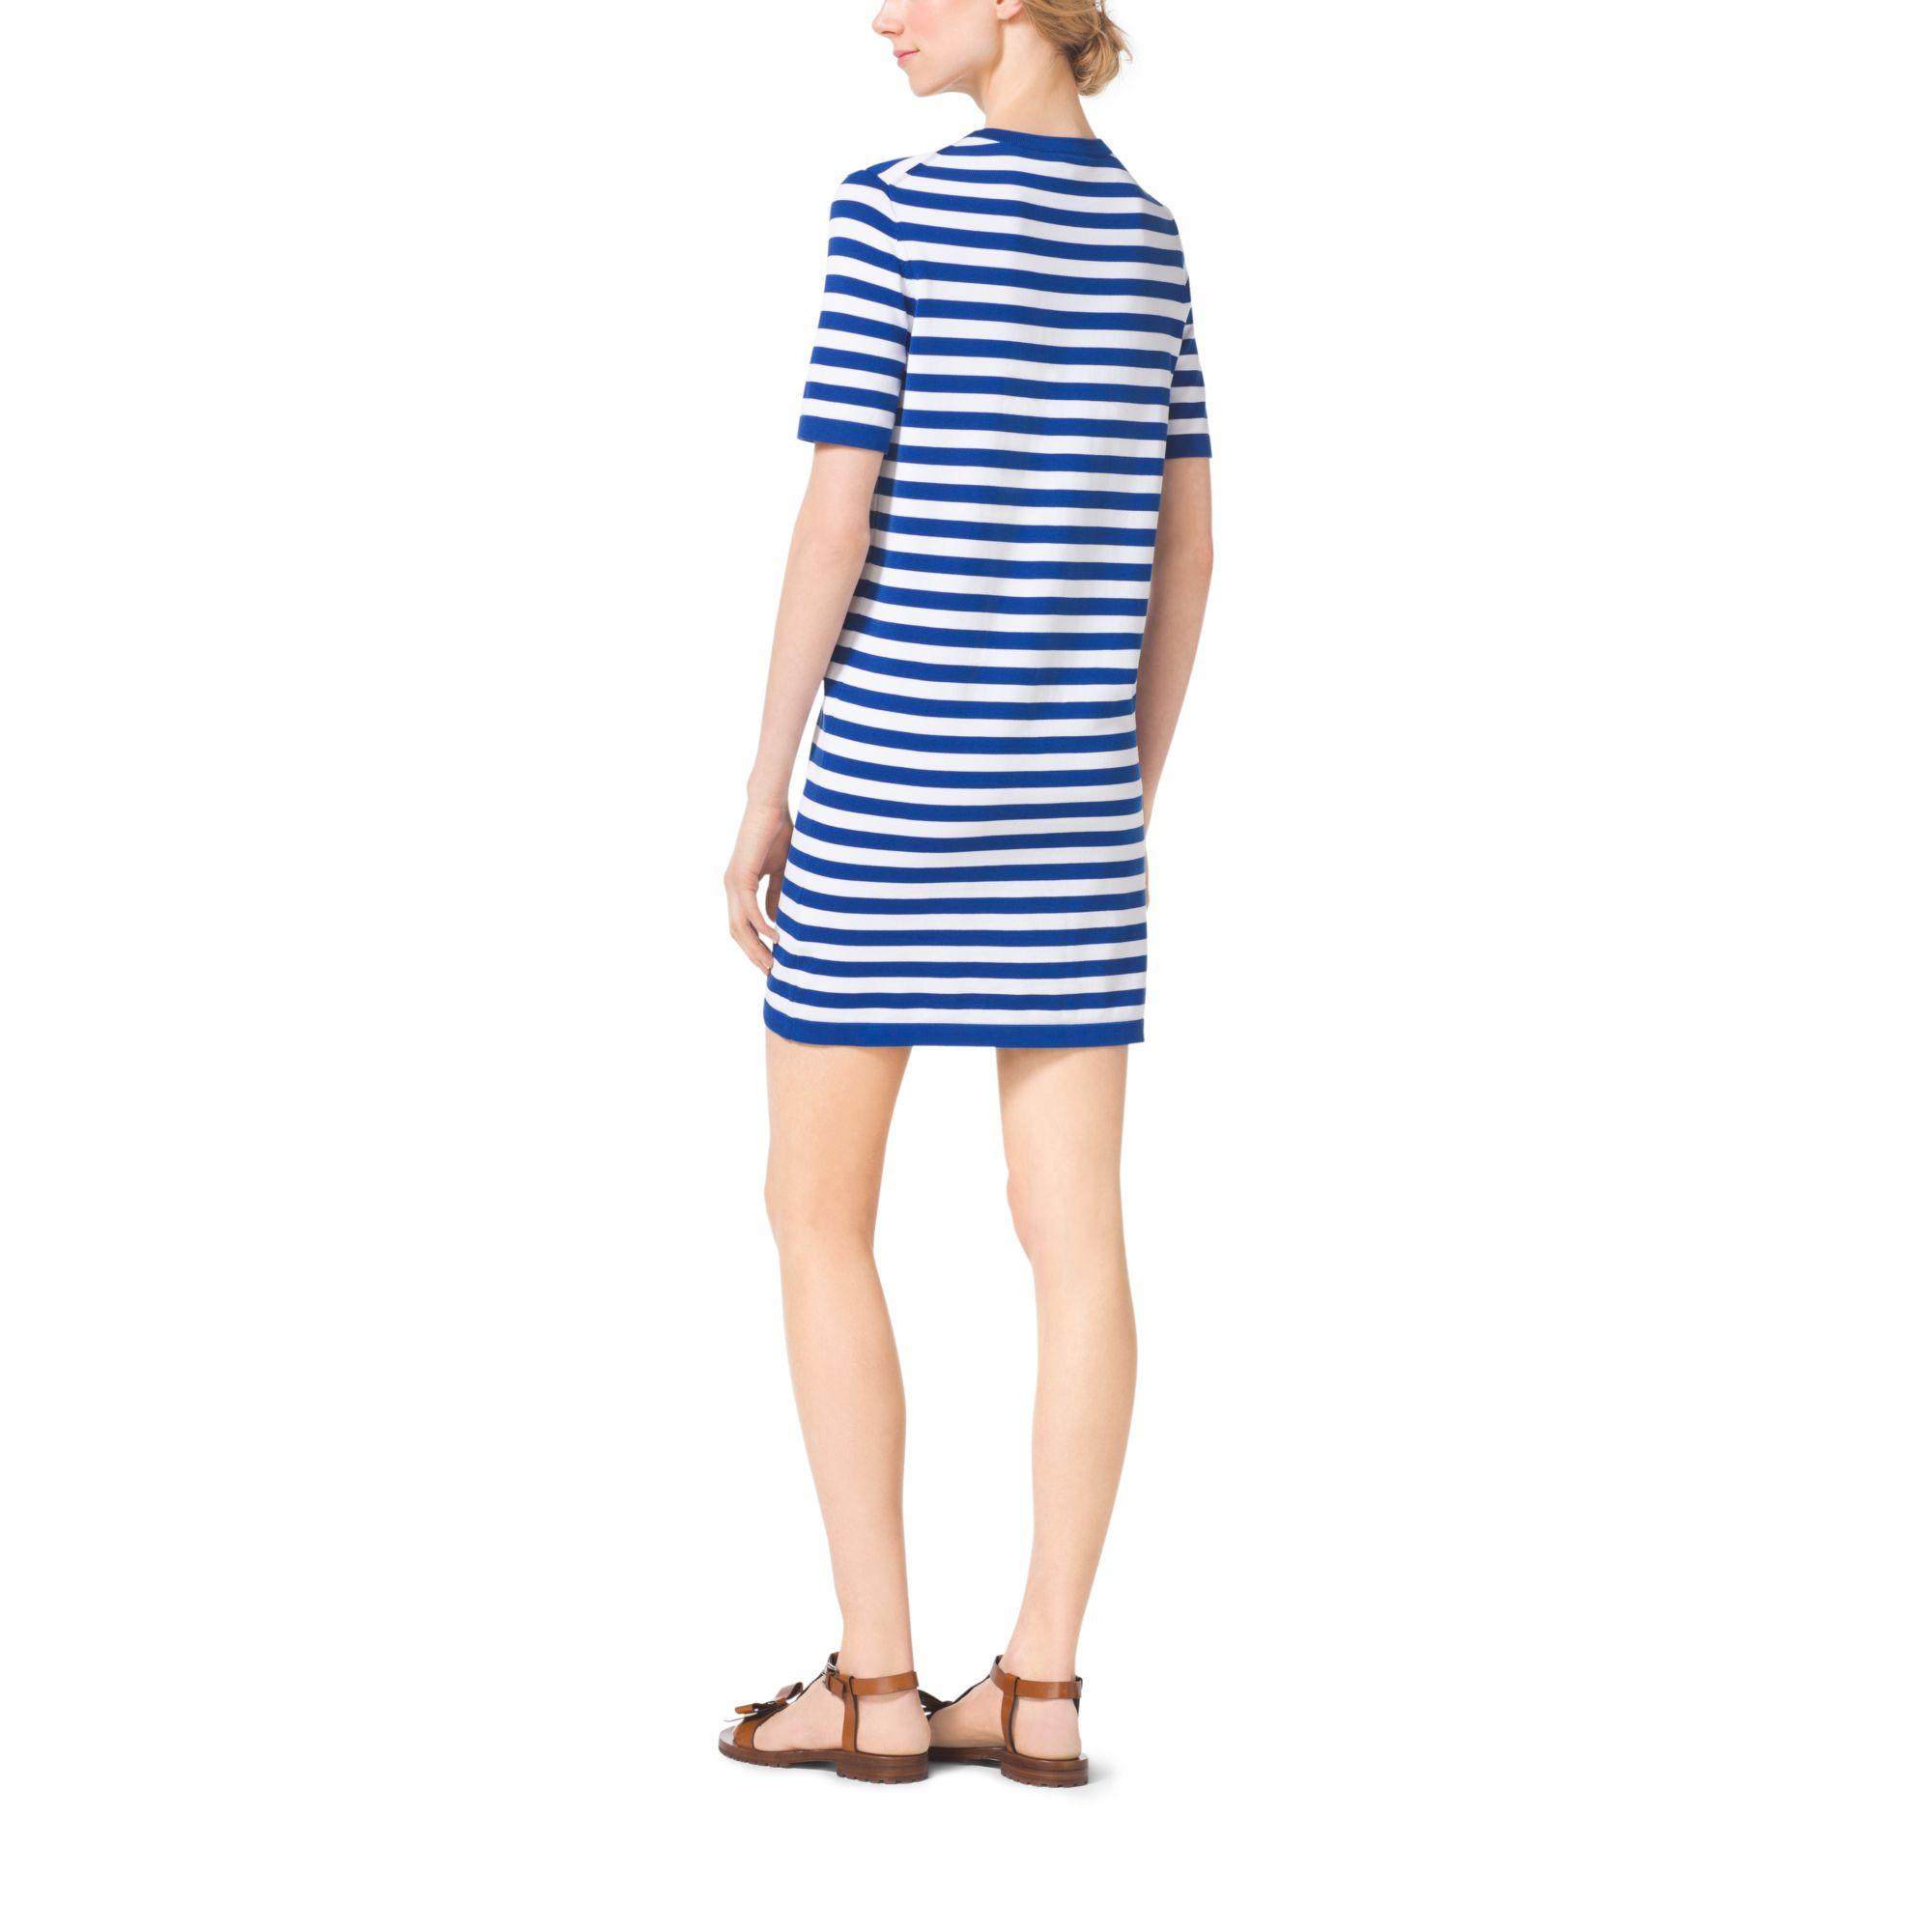 Lyst - Michael Kors Striped Compact-cotton T-shirt Dress in Blue c6e82227defb